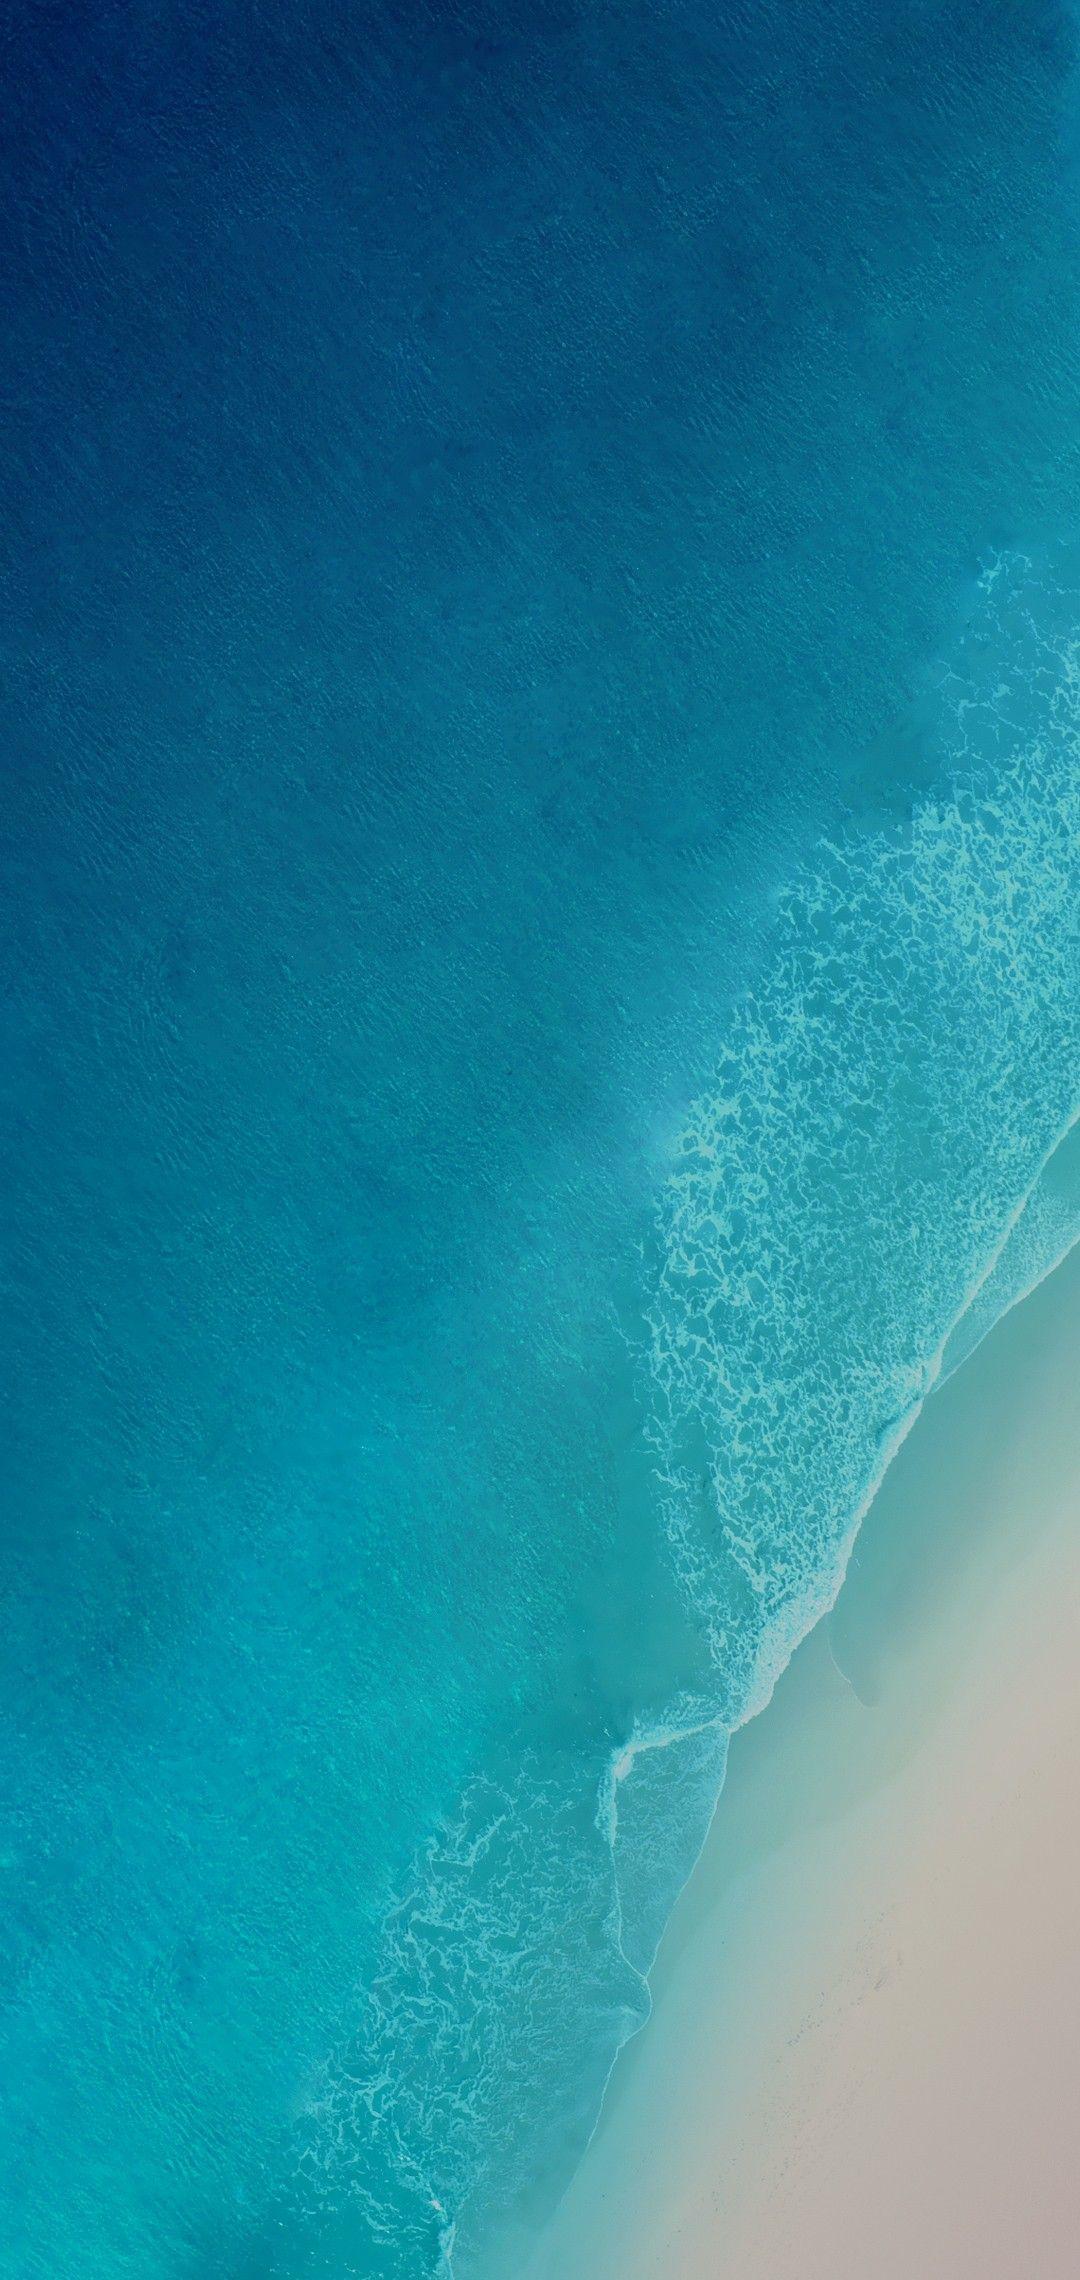 iOS 12 iPhone X Aqua blue Water ocean apple wallpaper 1080x2280